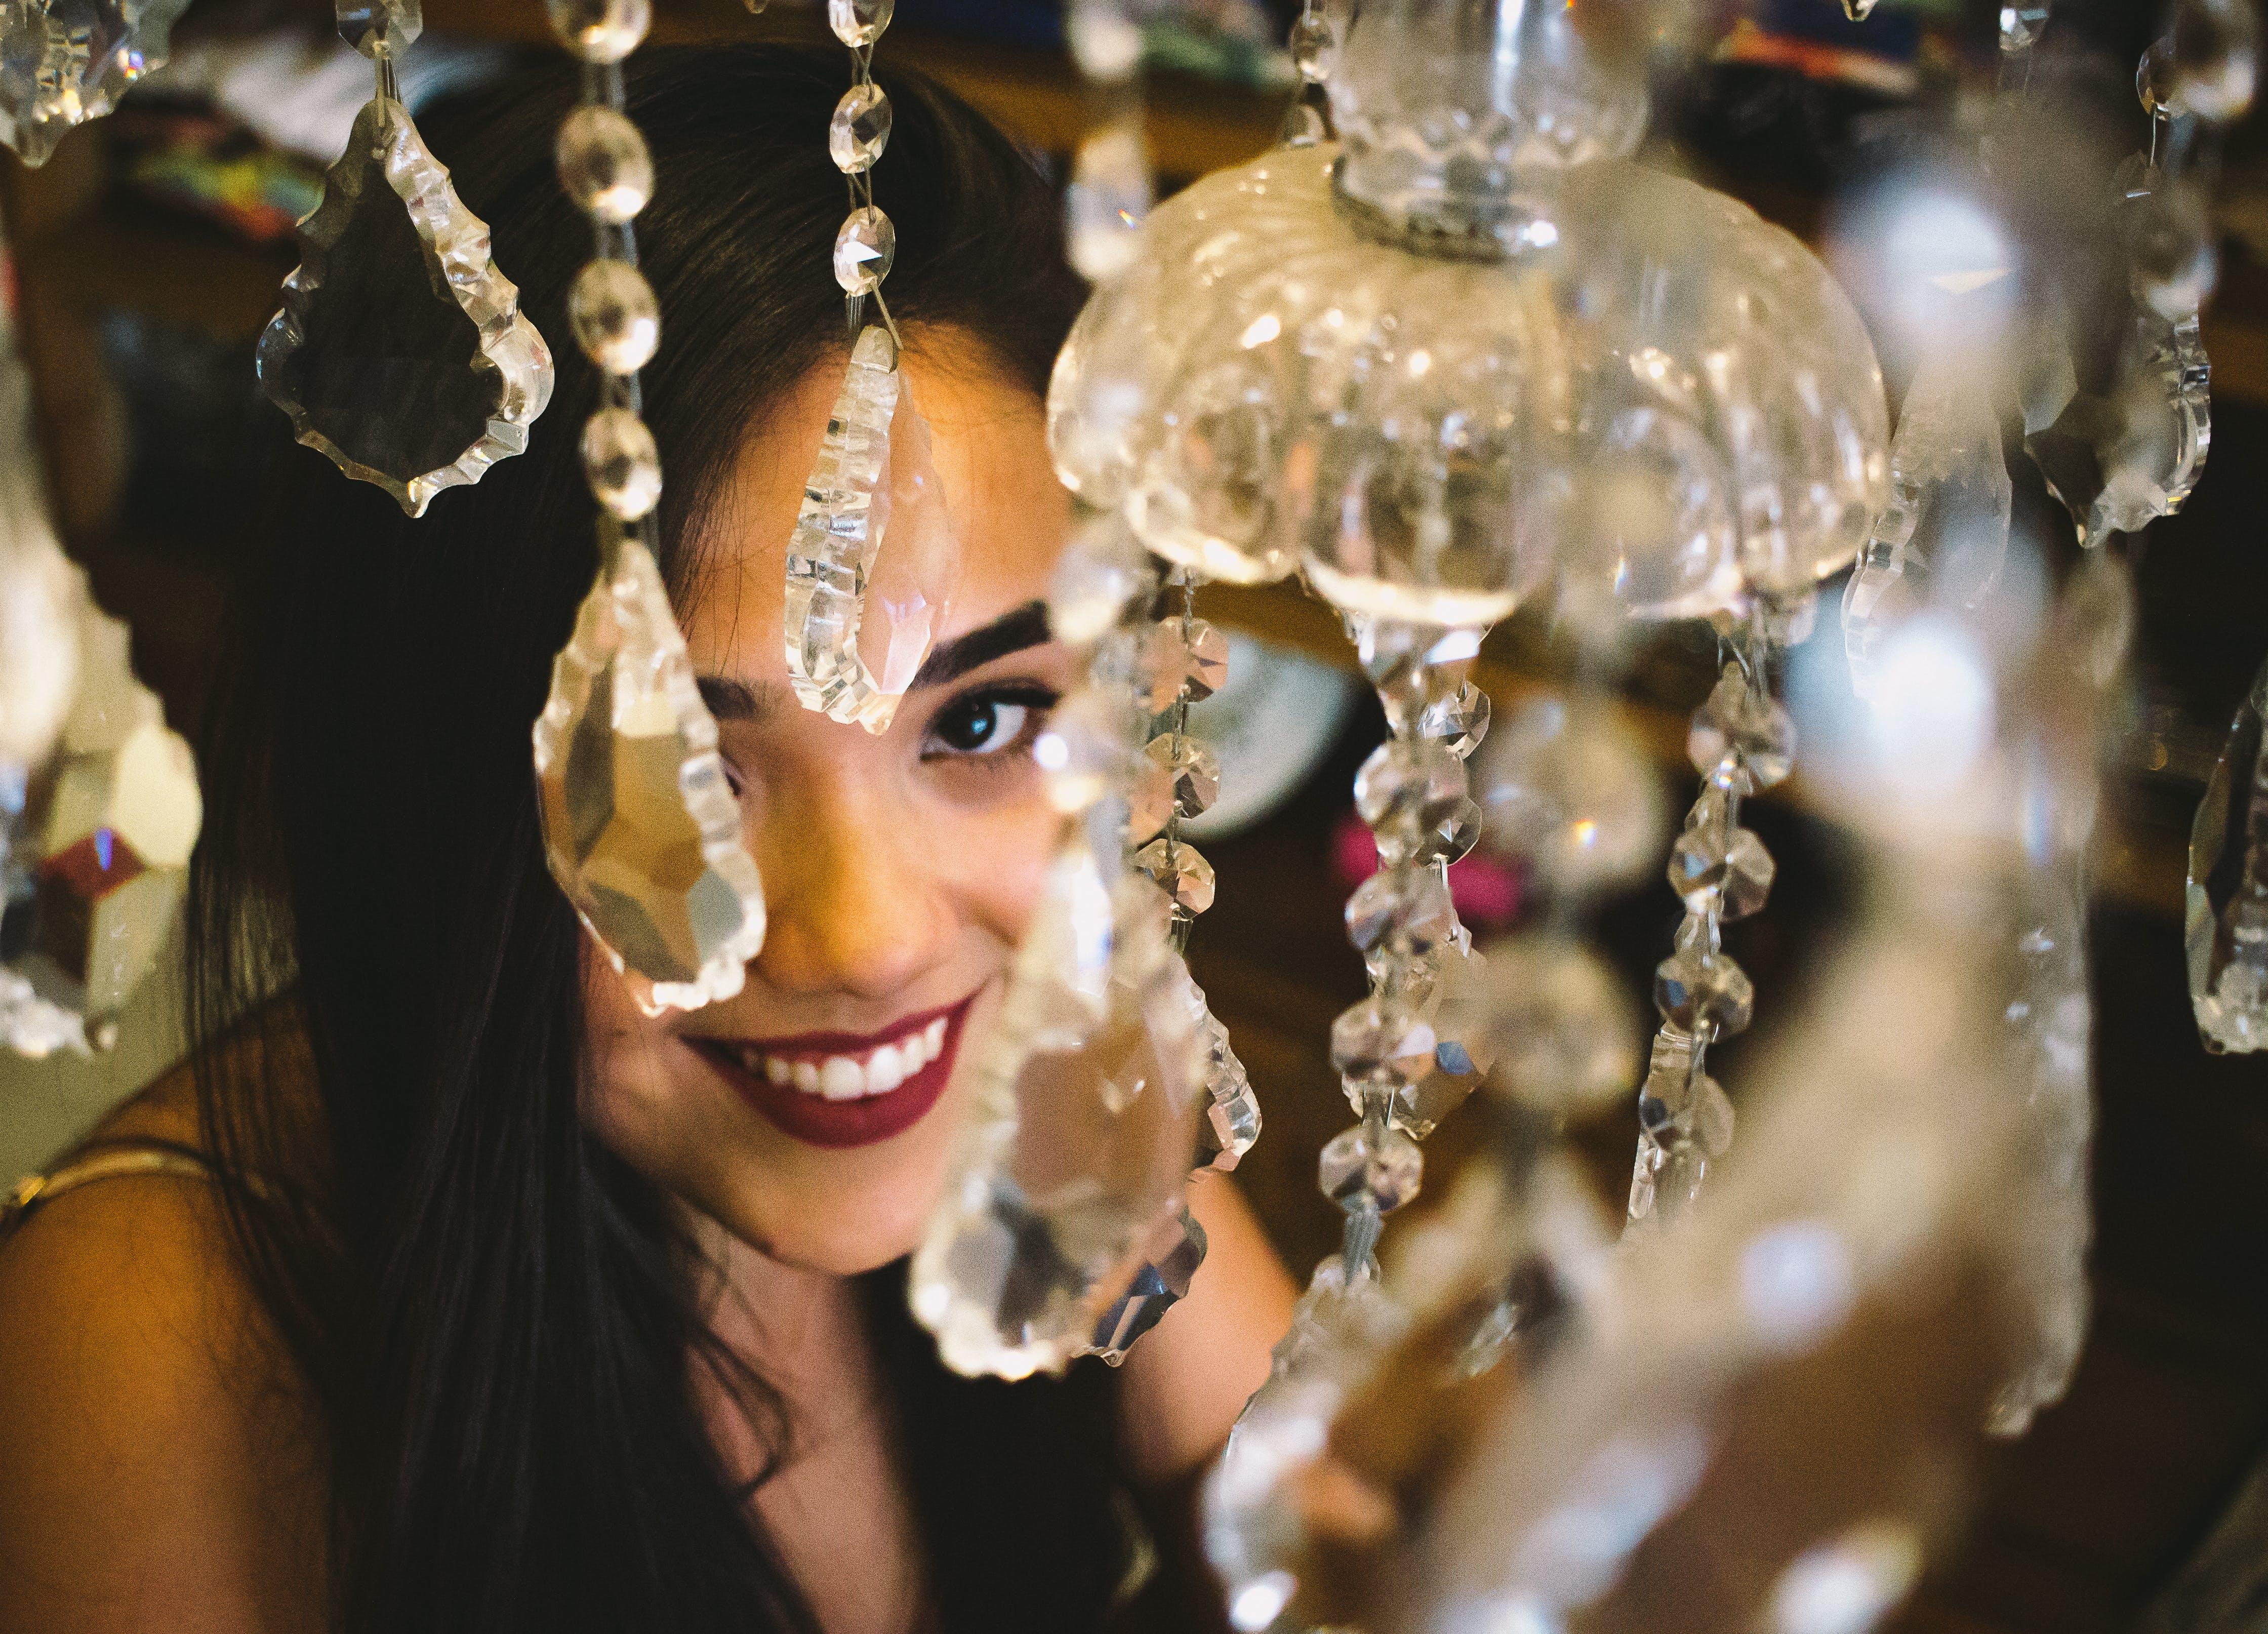 Woman Smiling Near Crystal Chandelier